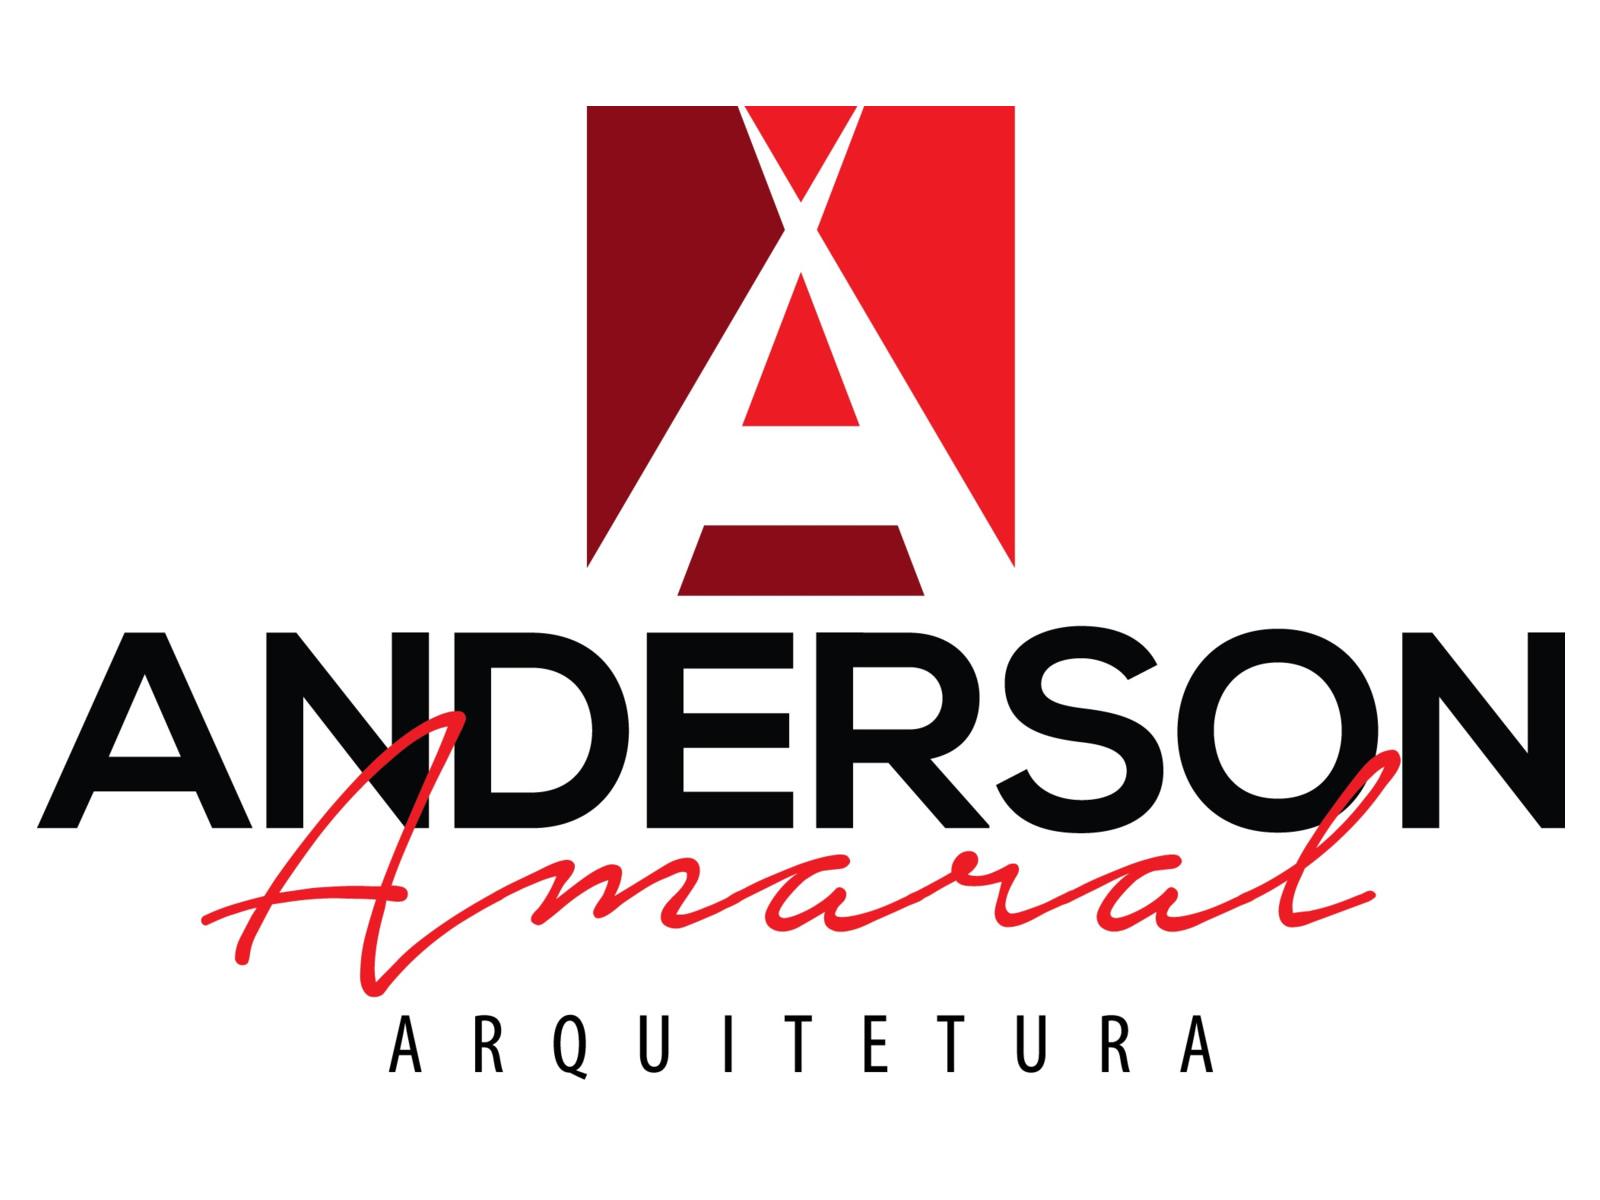 ANDERSON AMARAL - ARQUITETURA